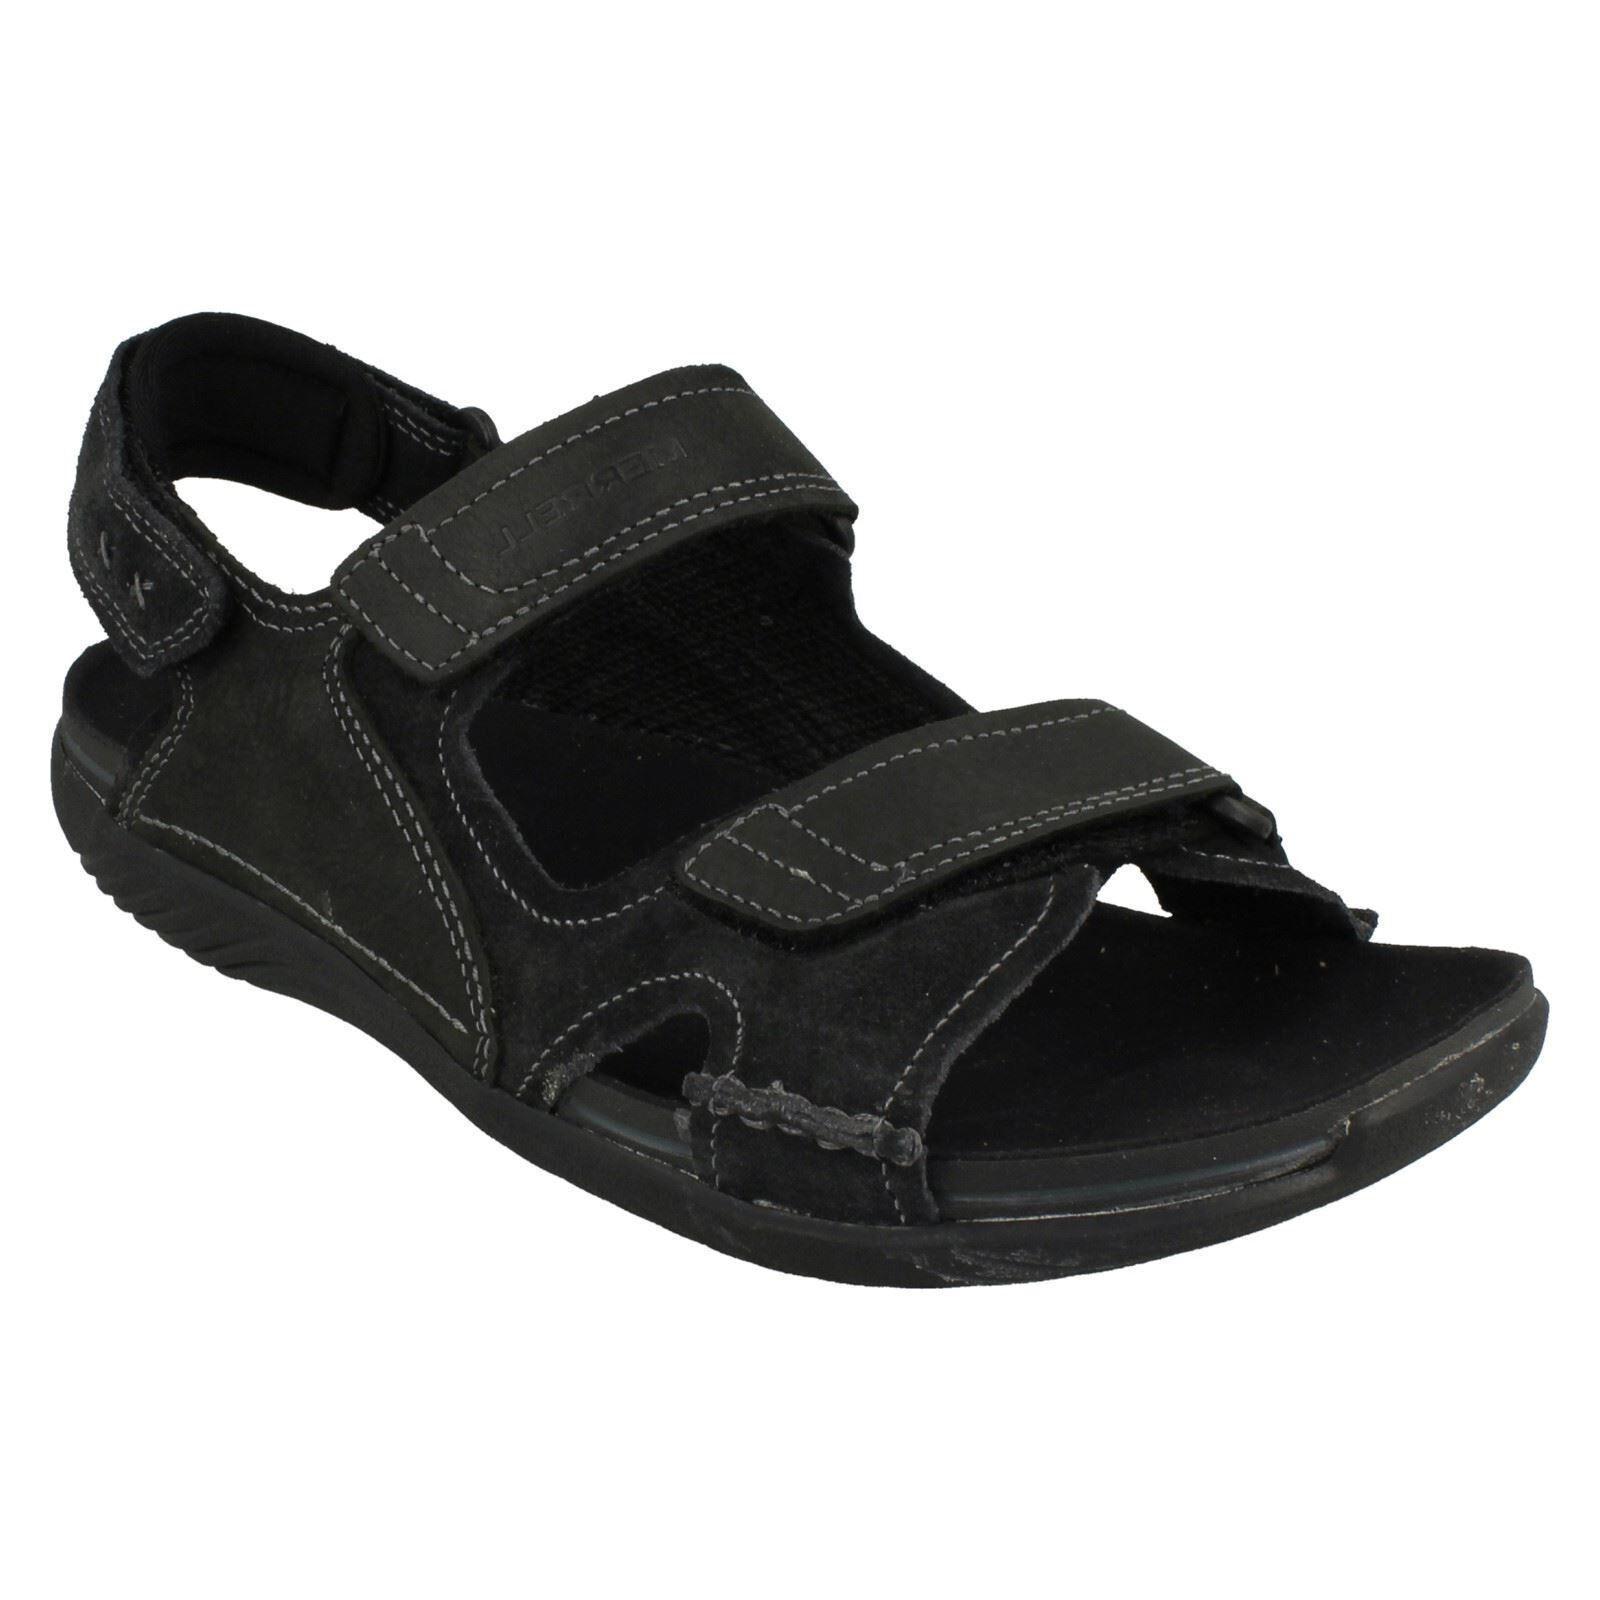 Herren MERRELL RIPTAPE SANDALS FASTENING CASUAL SUMMER Schuhe SANDALS RIPTAPE BASK DUO 0783b1